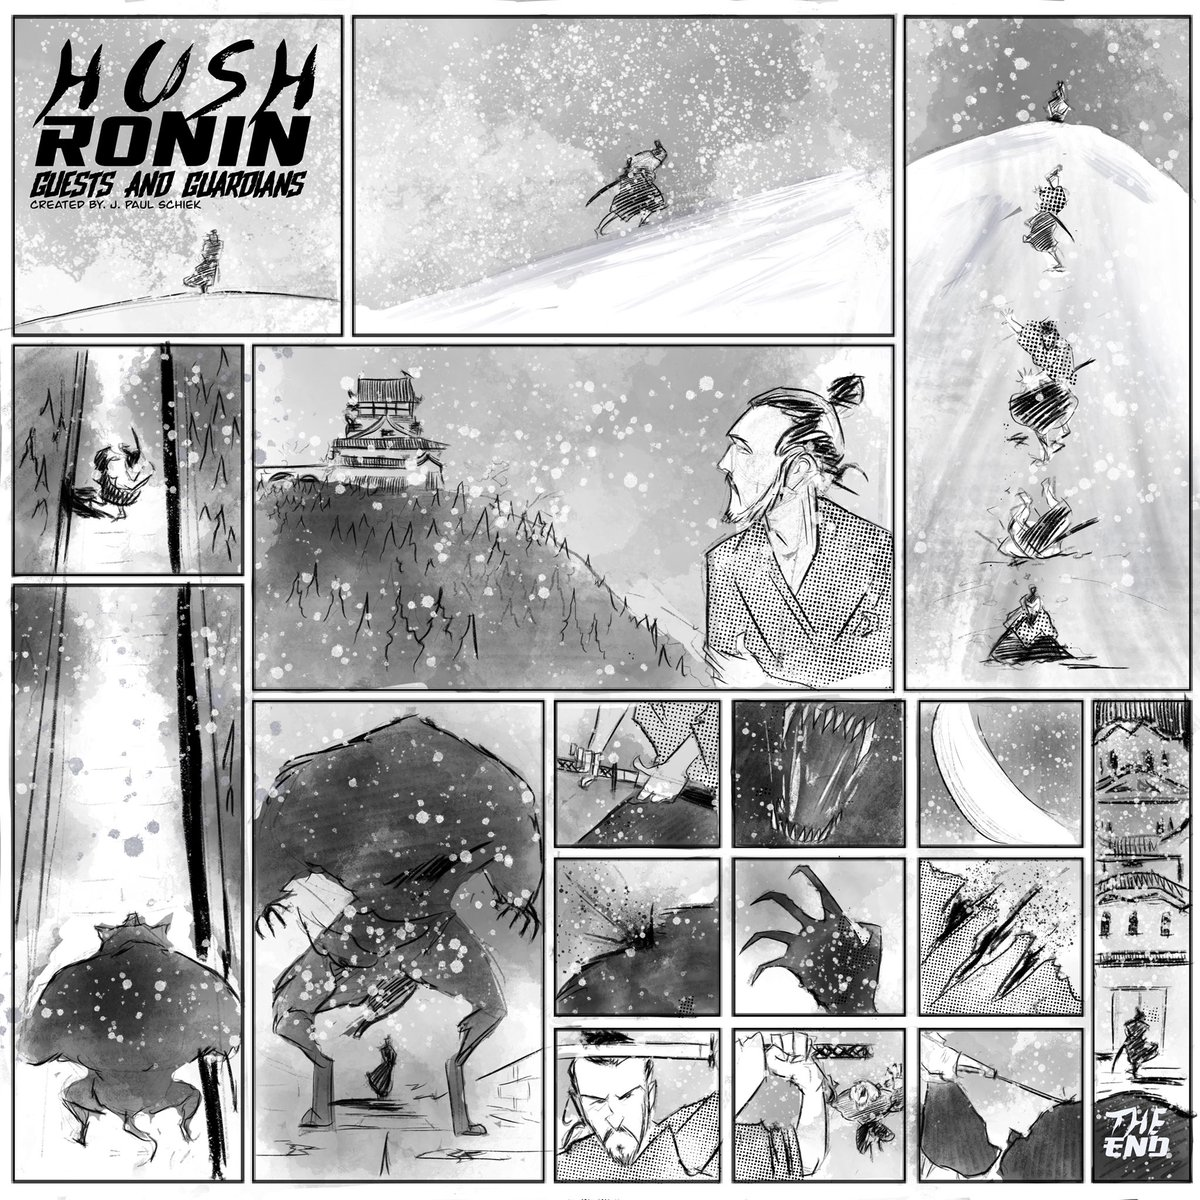 So, I stayed up late doing #homework for my #sequentialart class and made a one page #HushRonin short. @AshcanComicsPub   #art #artwork #artist #samurai #werewolf #comics #comicbooks #makecomics #makingcomics #winteriscoming<br>http://pic.twitter.com/6EWSdeqMds